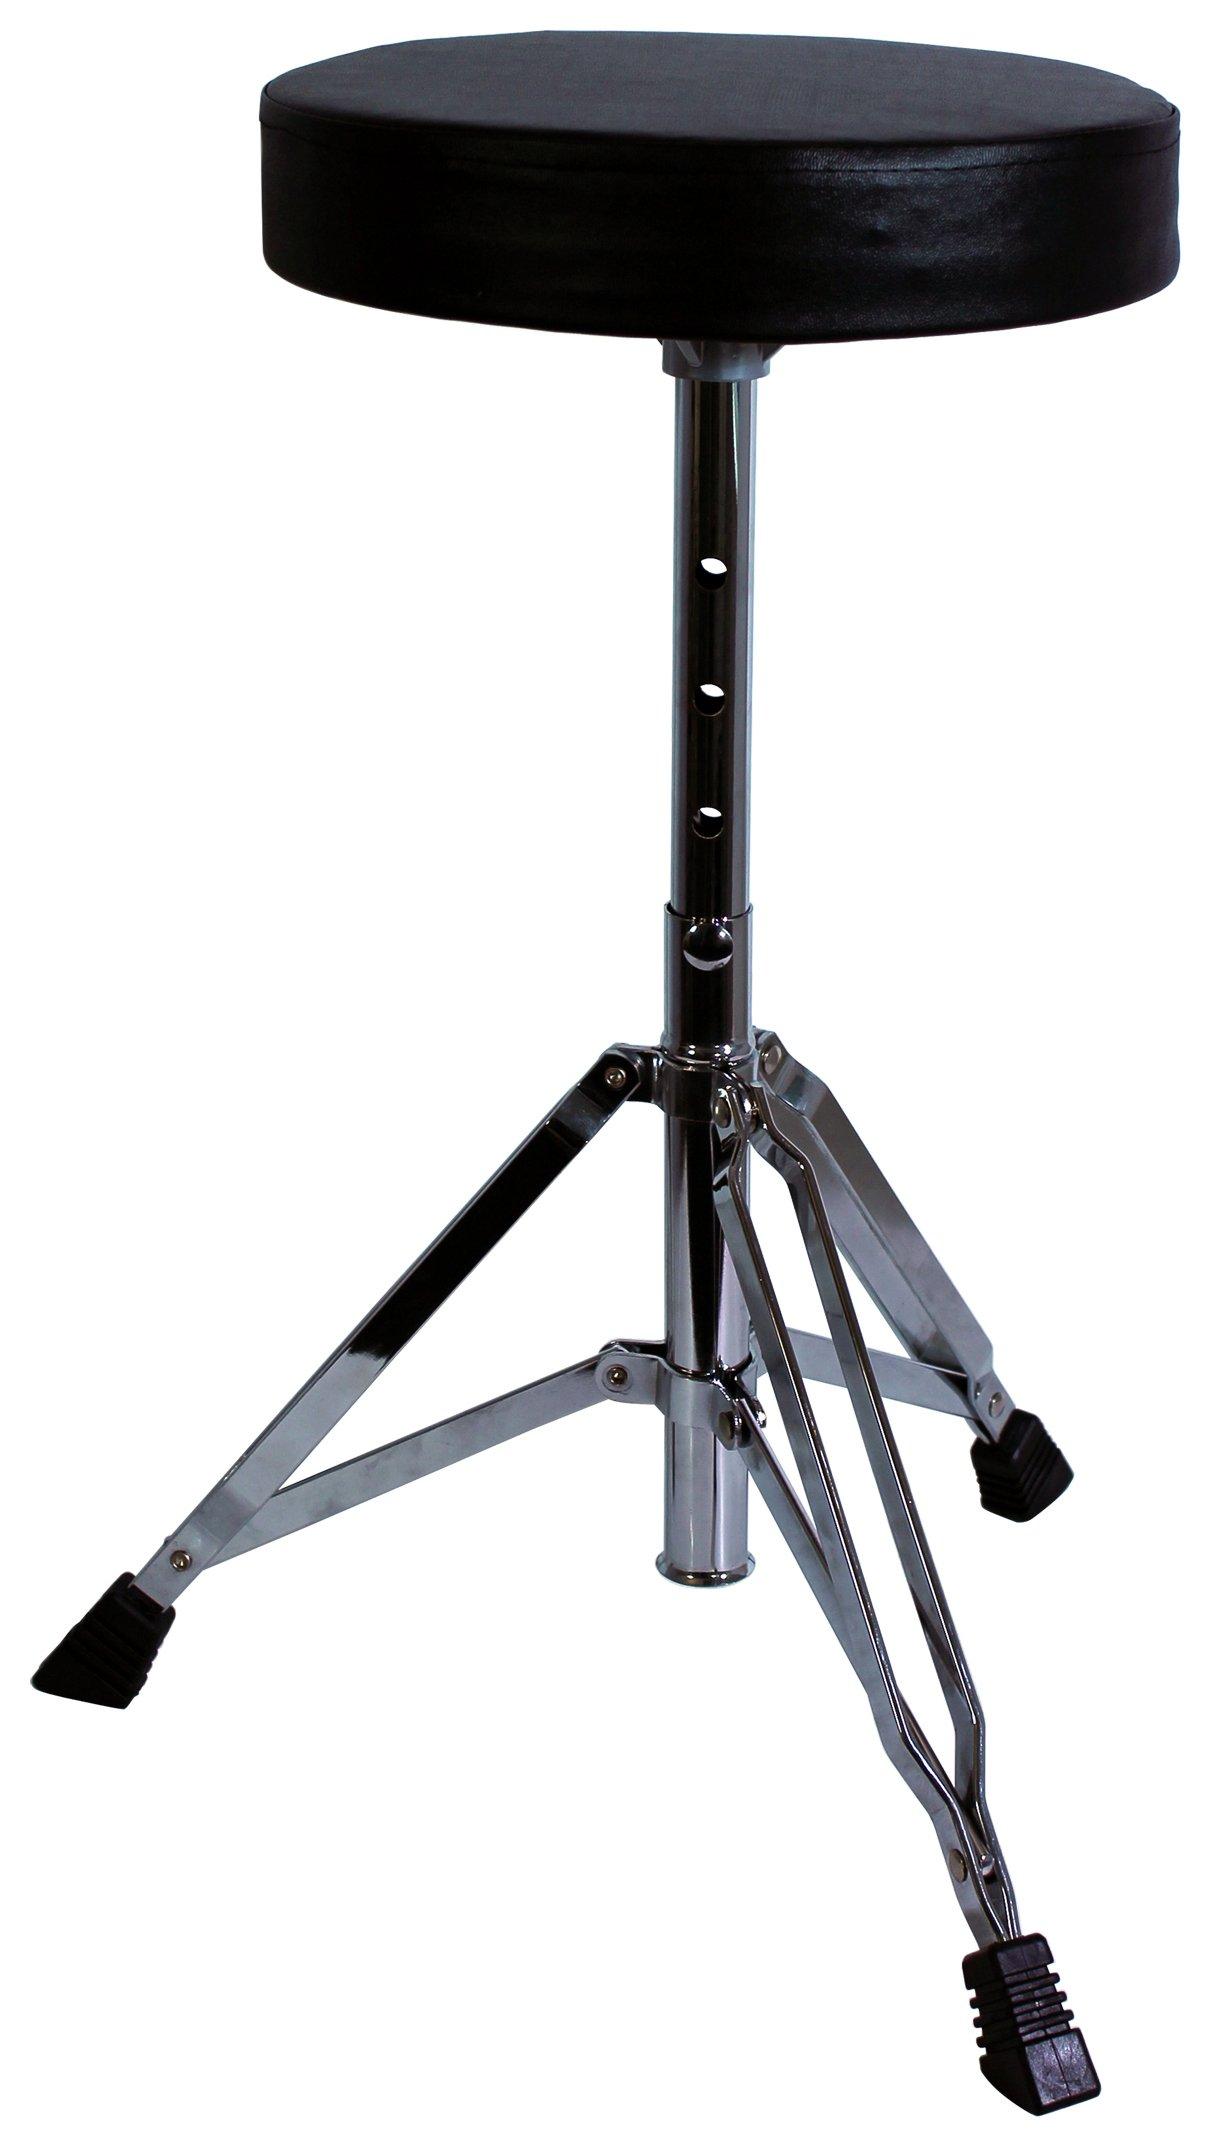 Click to zoom  sc 1 st  Argos & Buy Rockburn Adjustable Drum Stool at Argos.co.uk - Your Online ... islam-shia.org